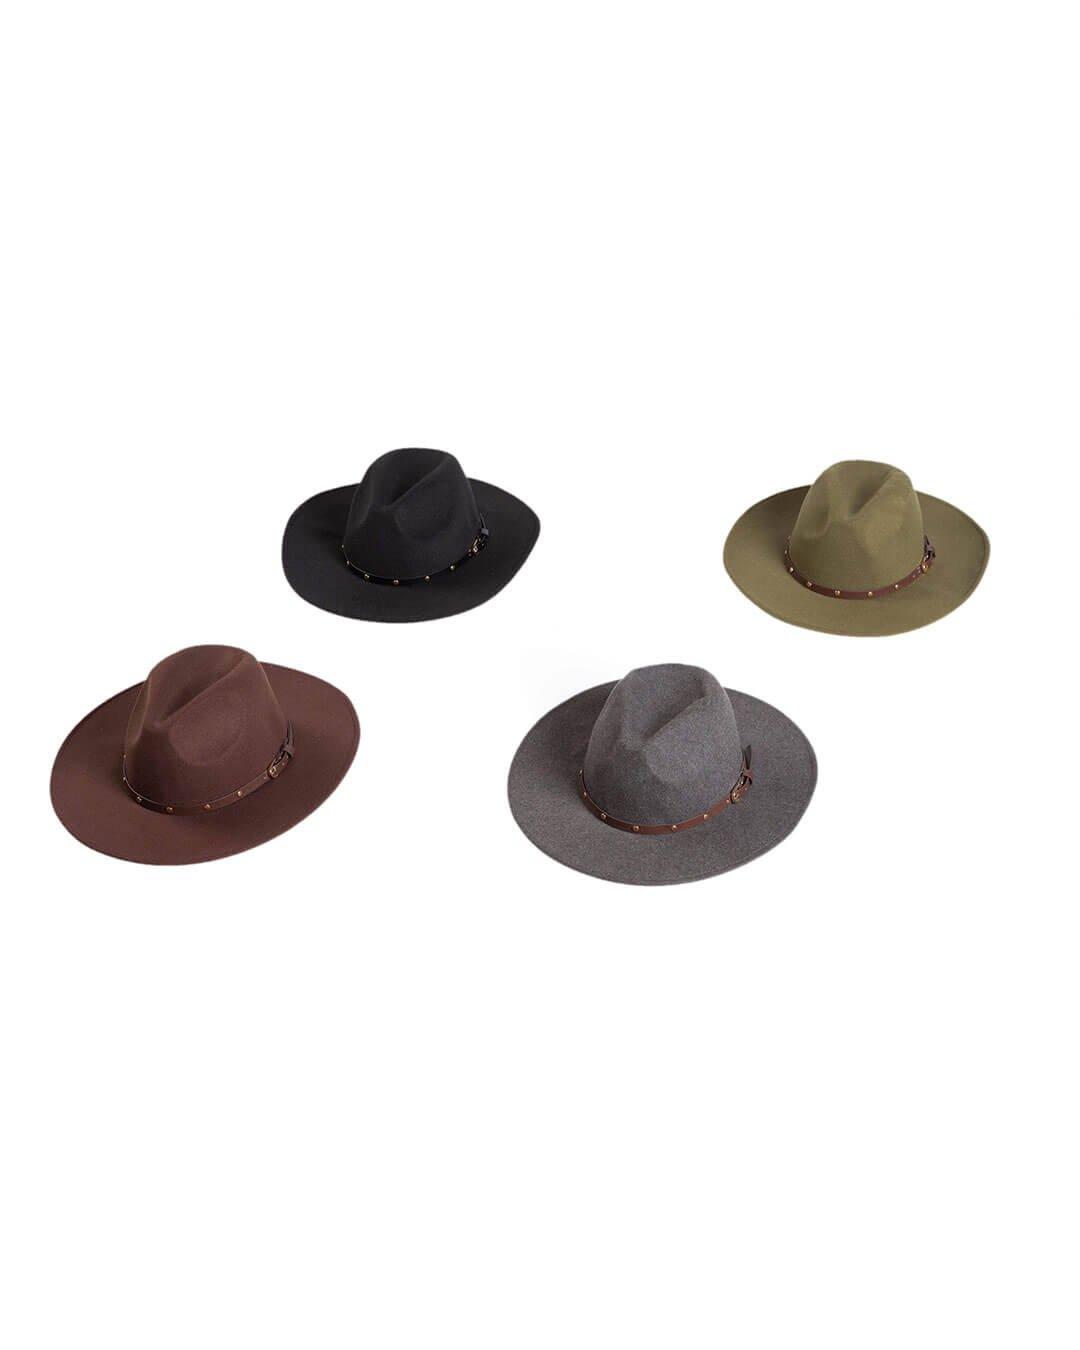 DYW-18-08 - Fötr Şapka - CMF Tekstil